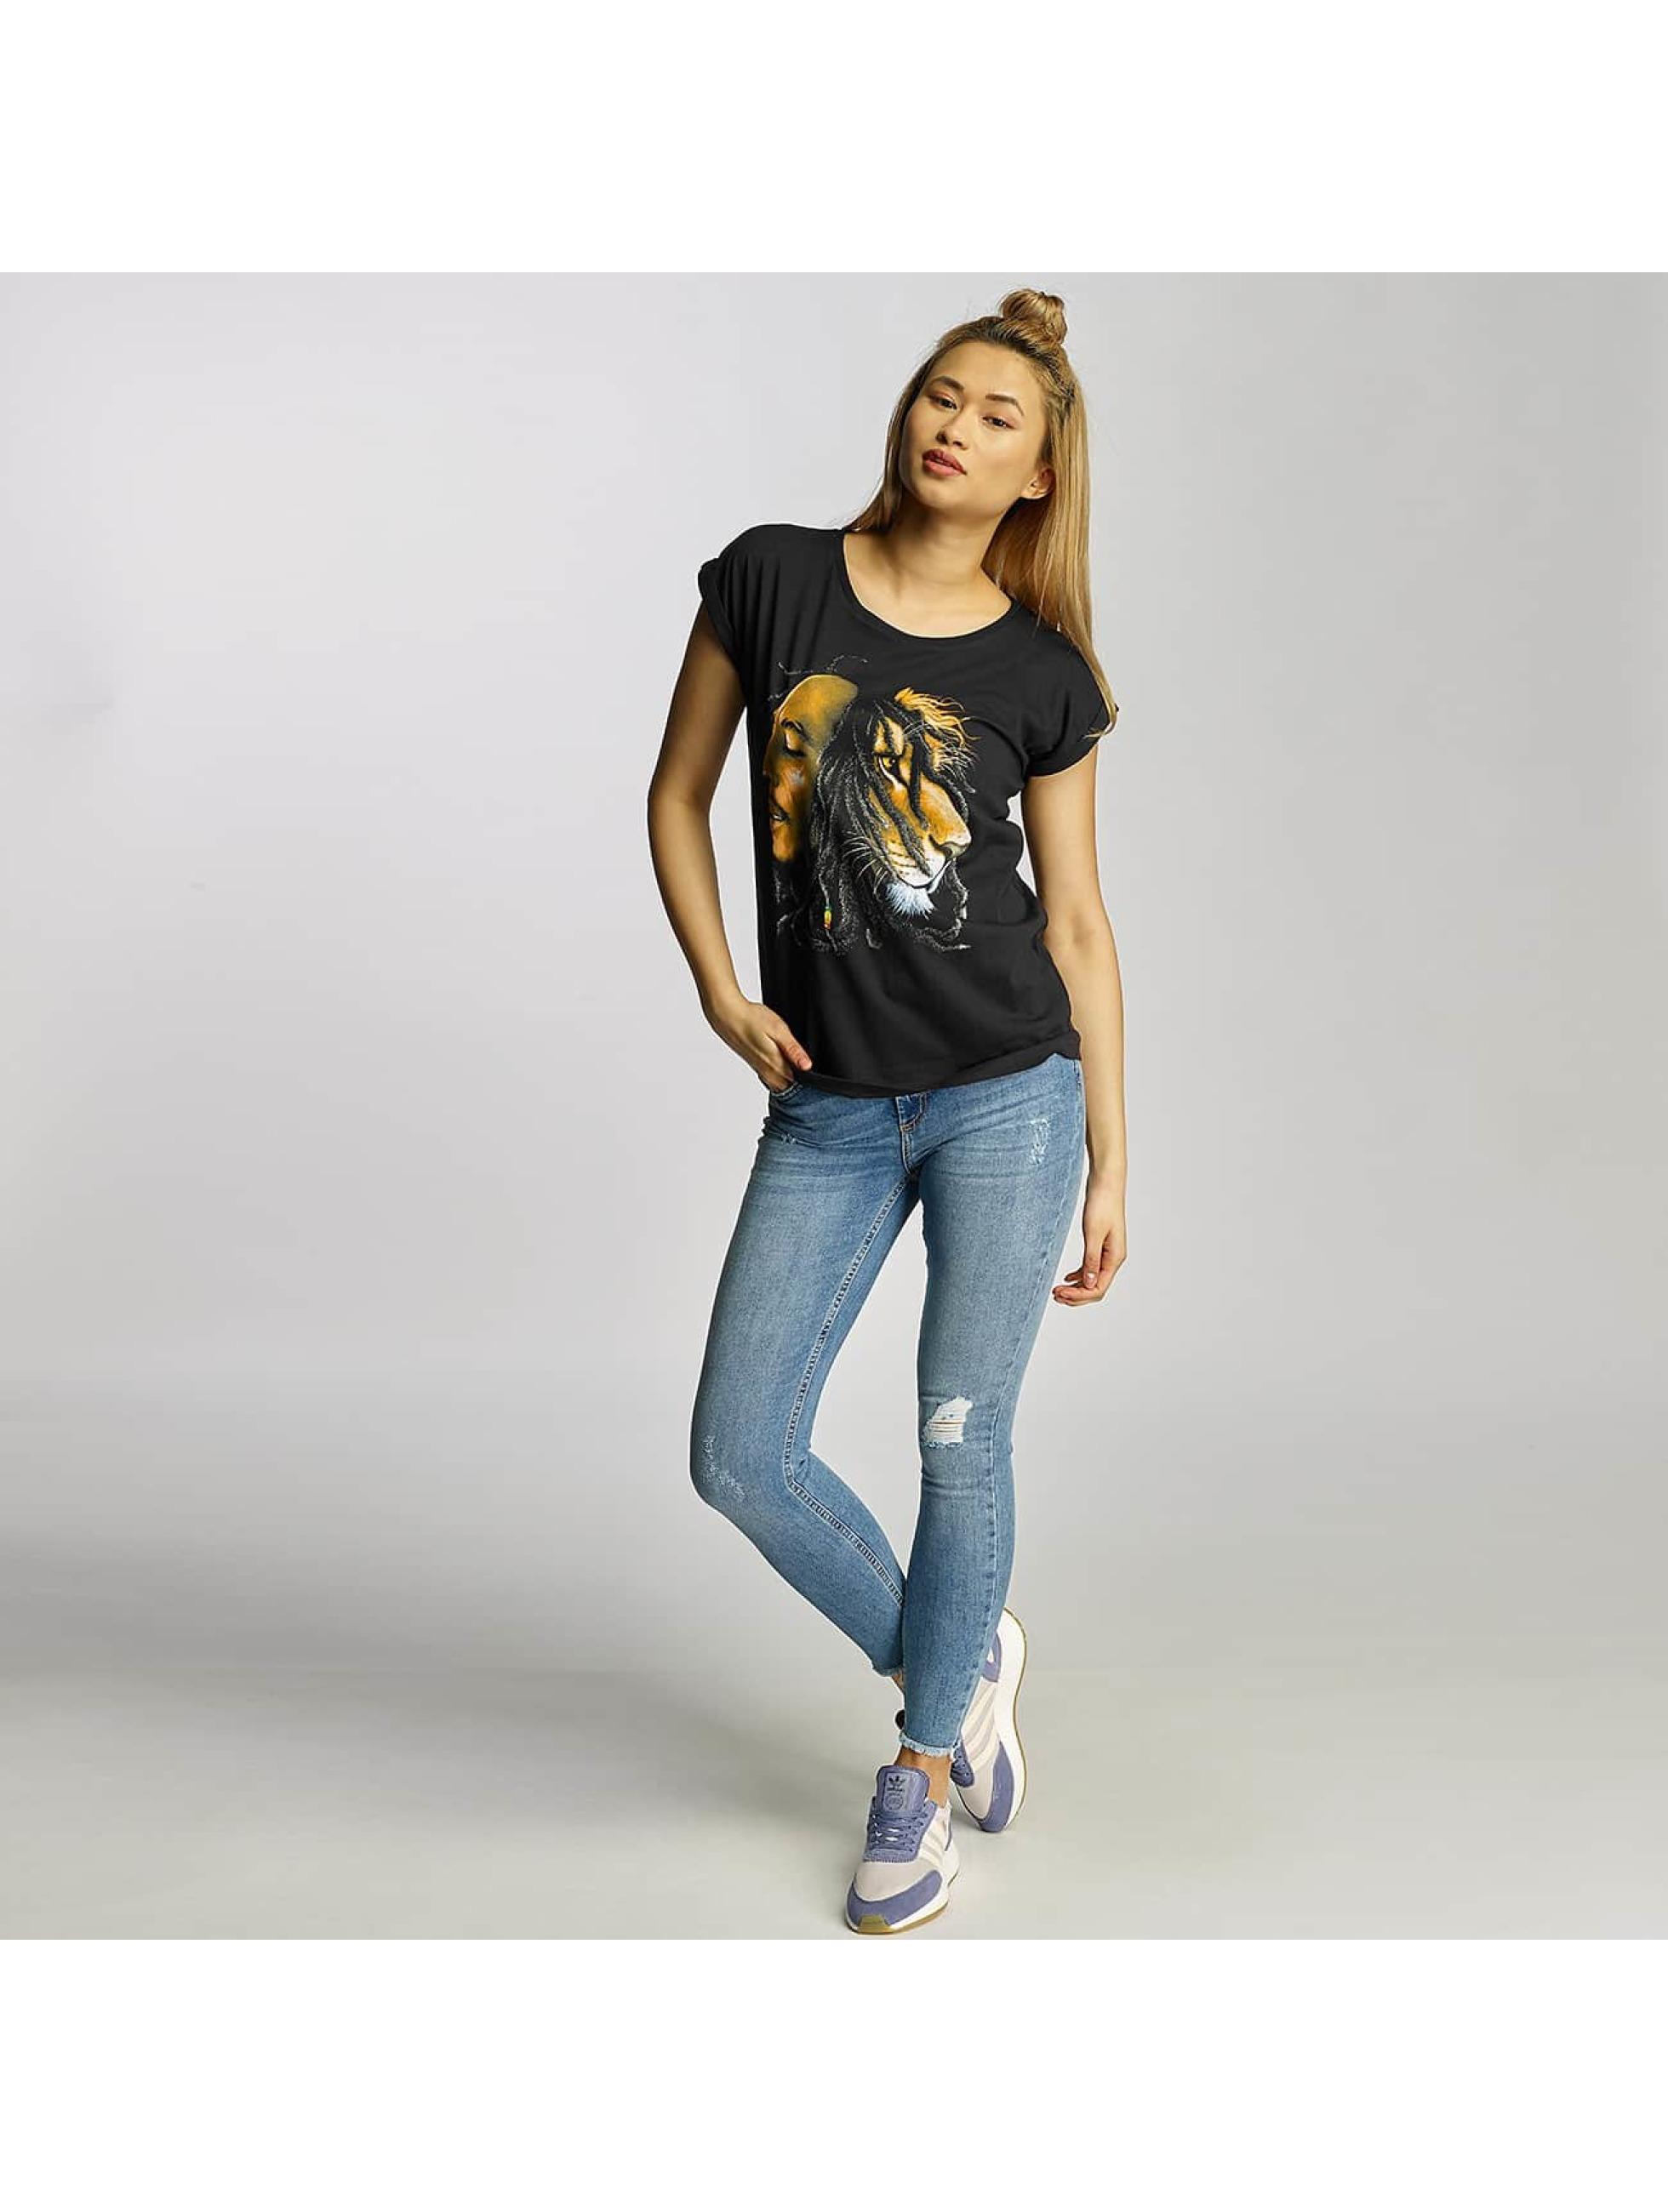 Mister Tee T-Shirt Ladies Bob Marley Lion Face schwarz